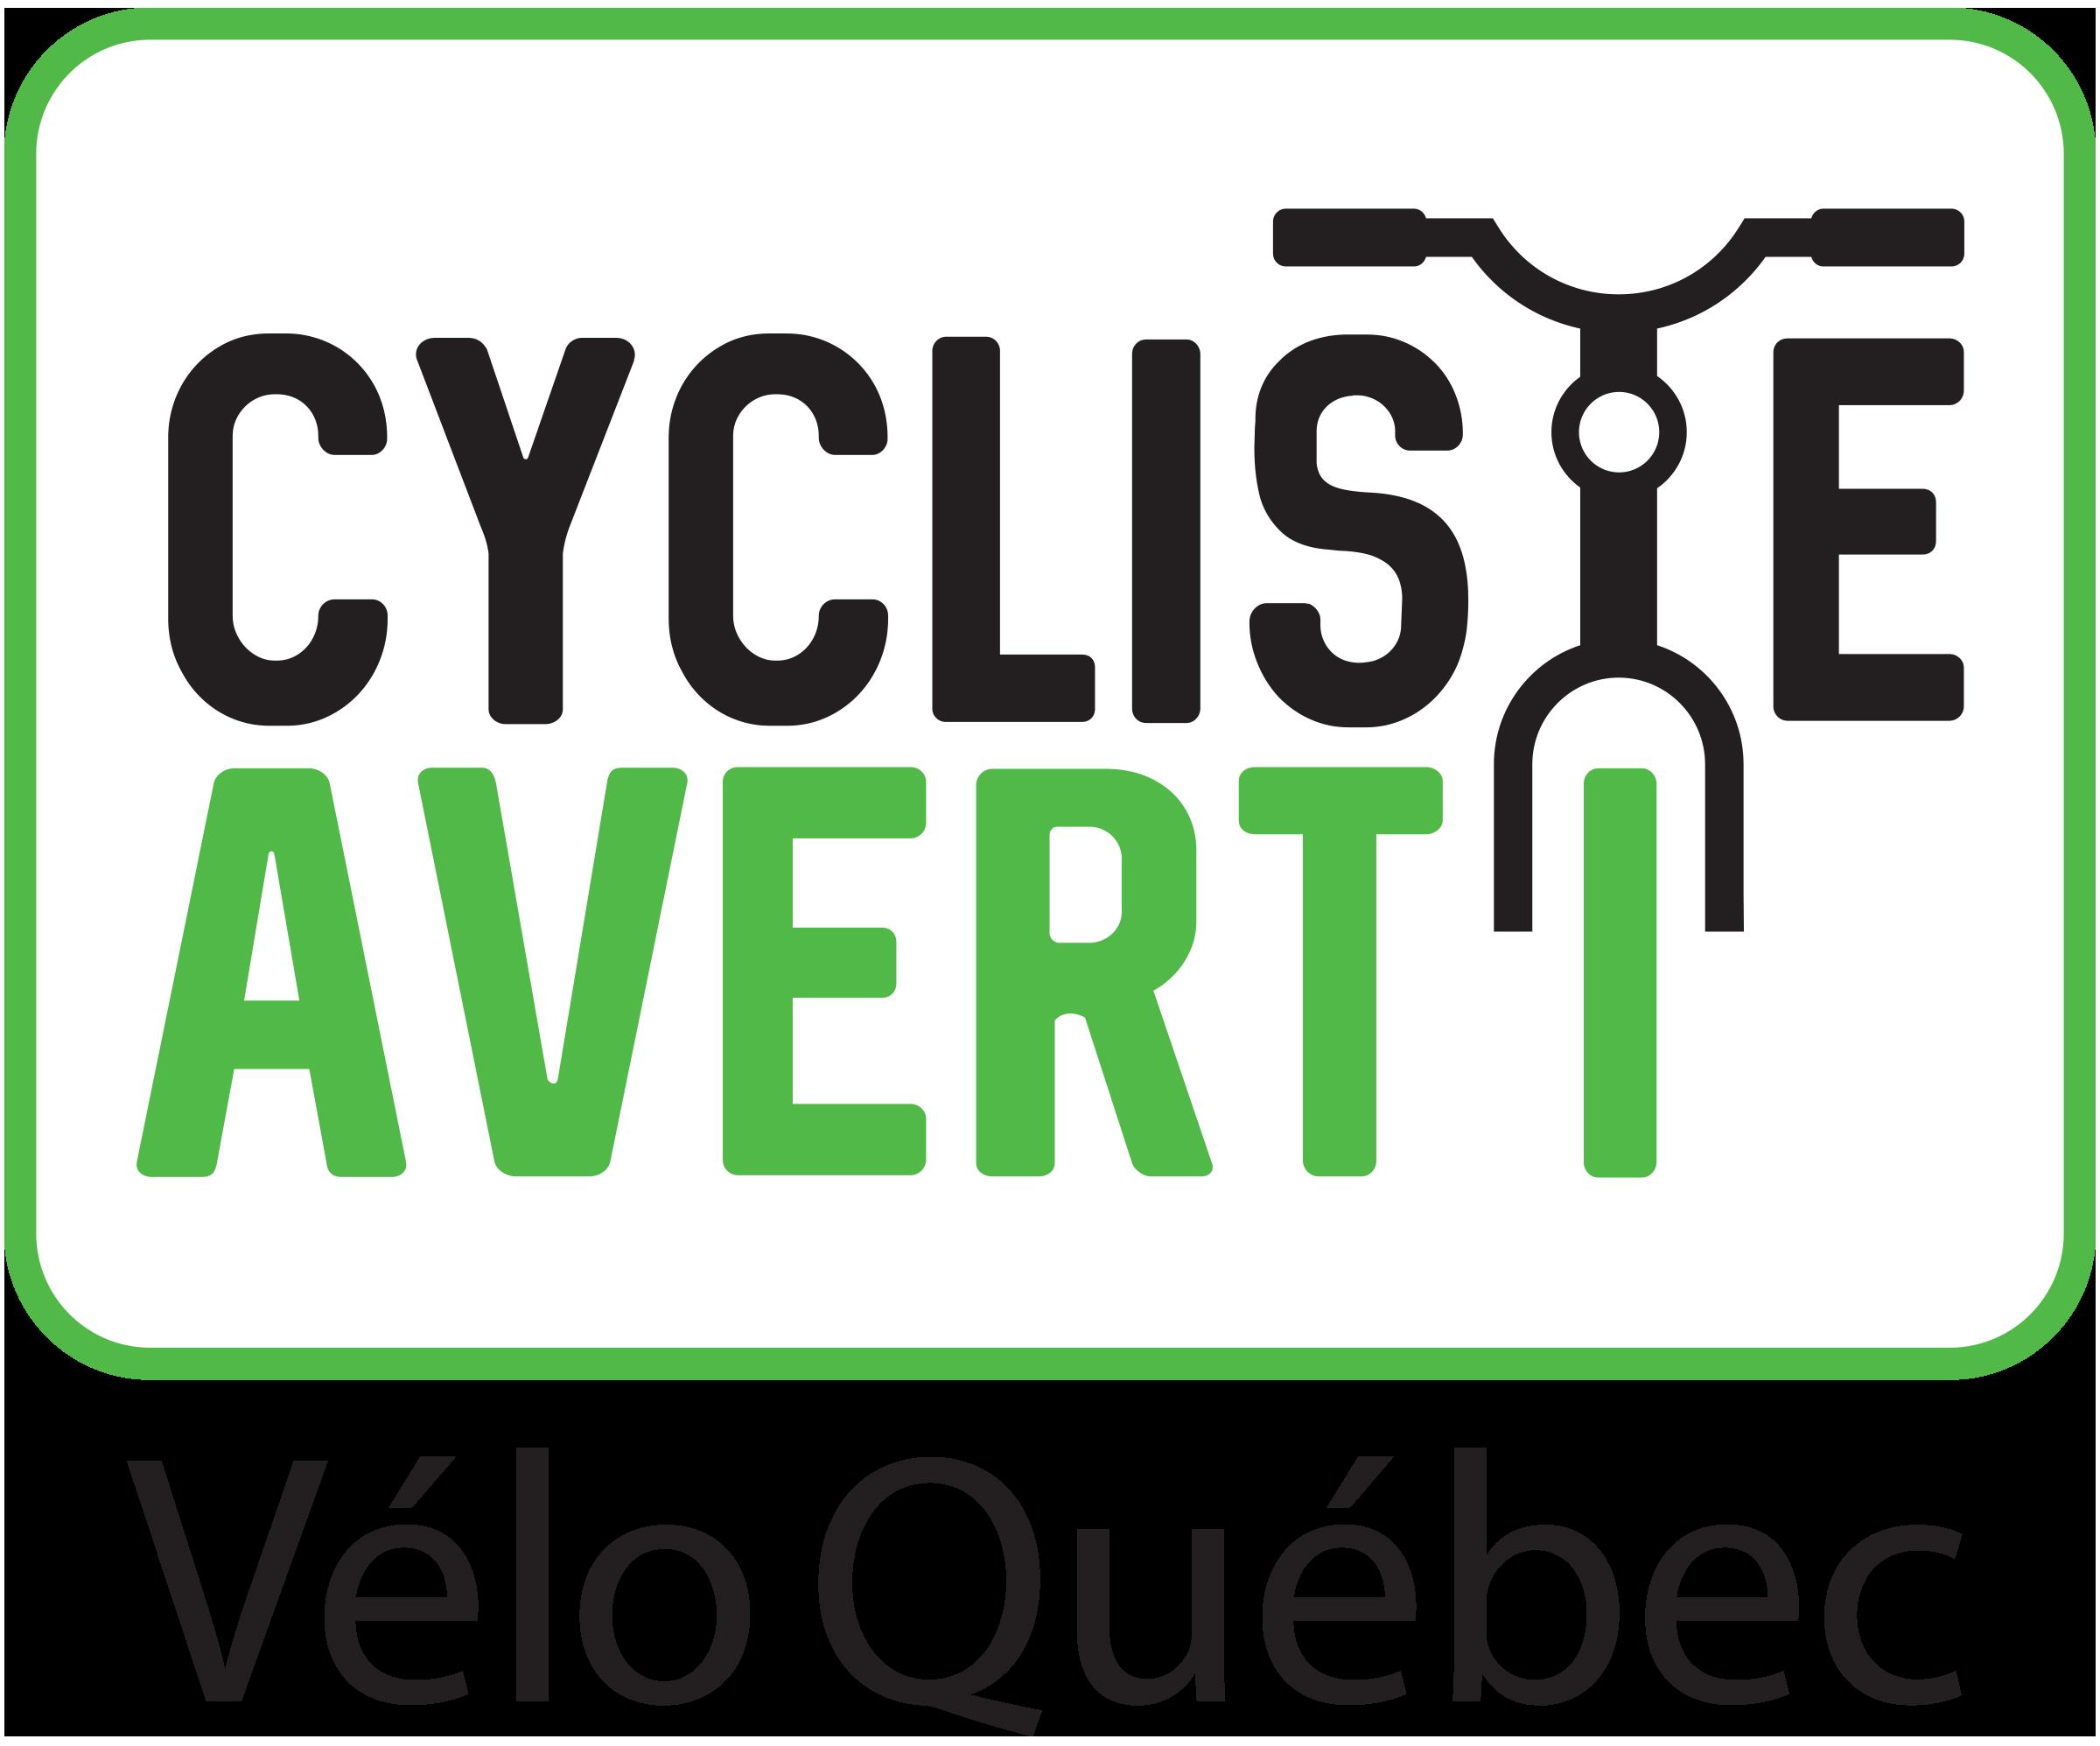 Cycliste averti